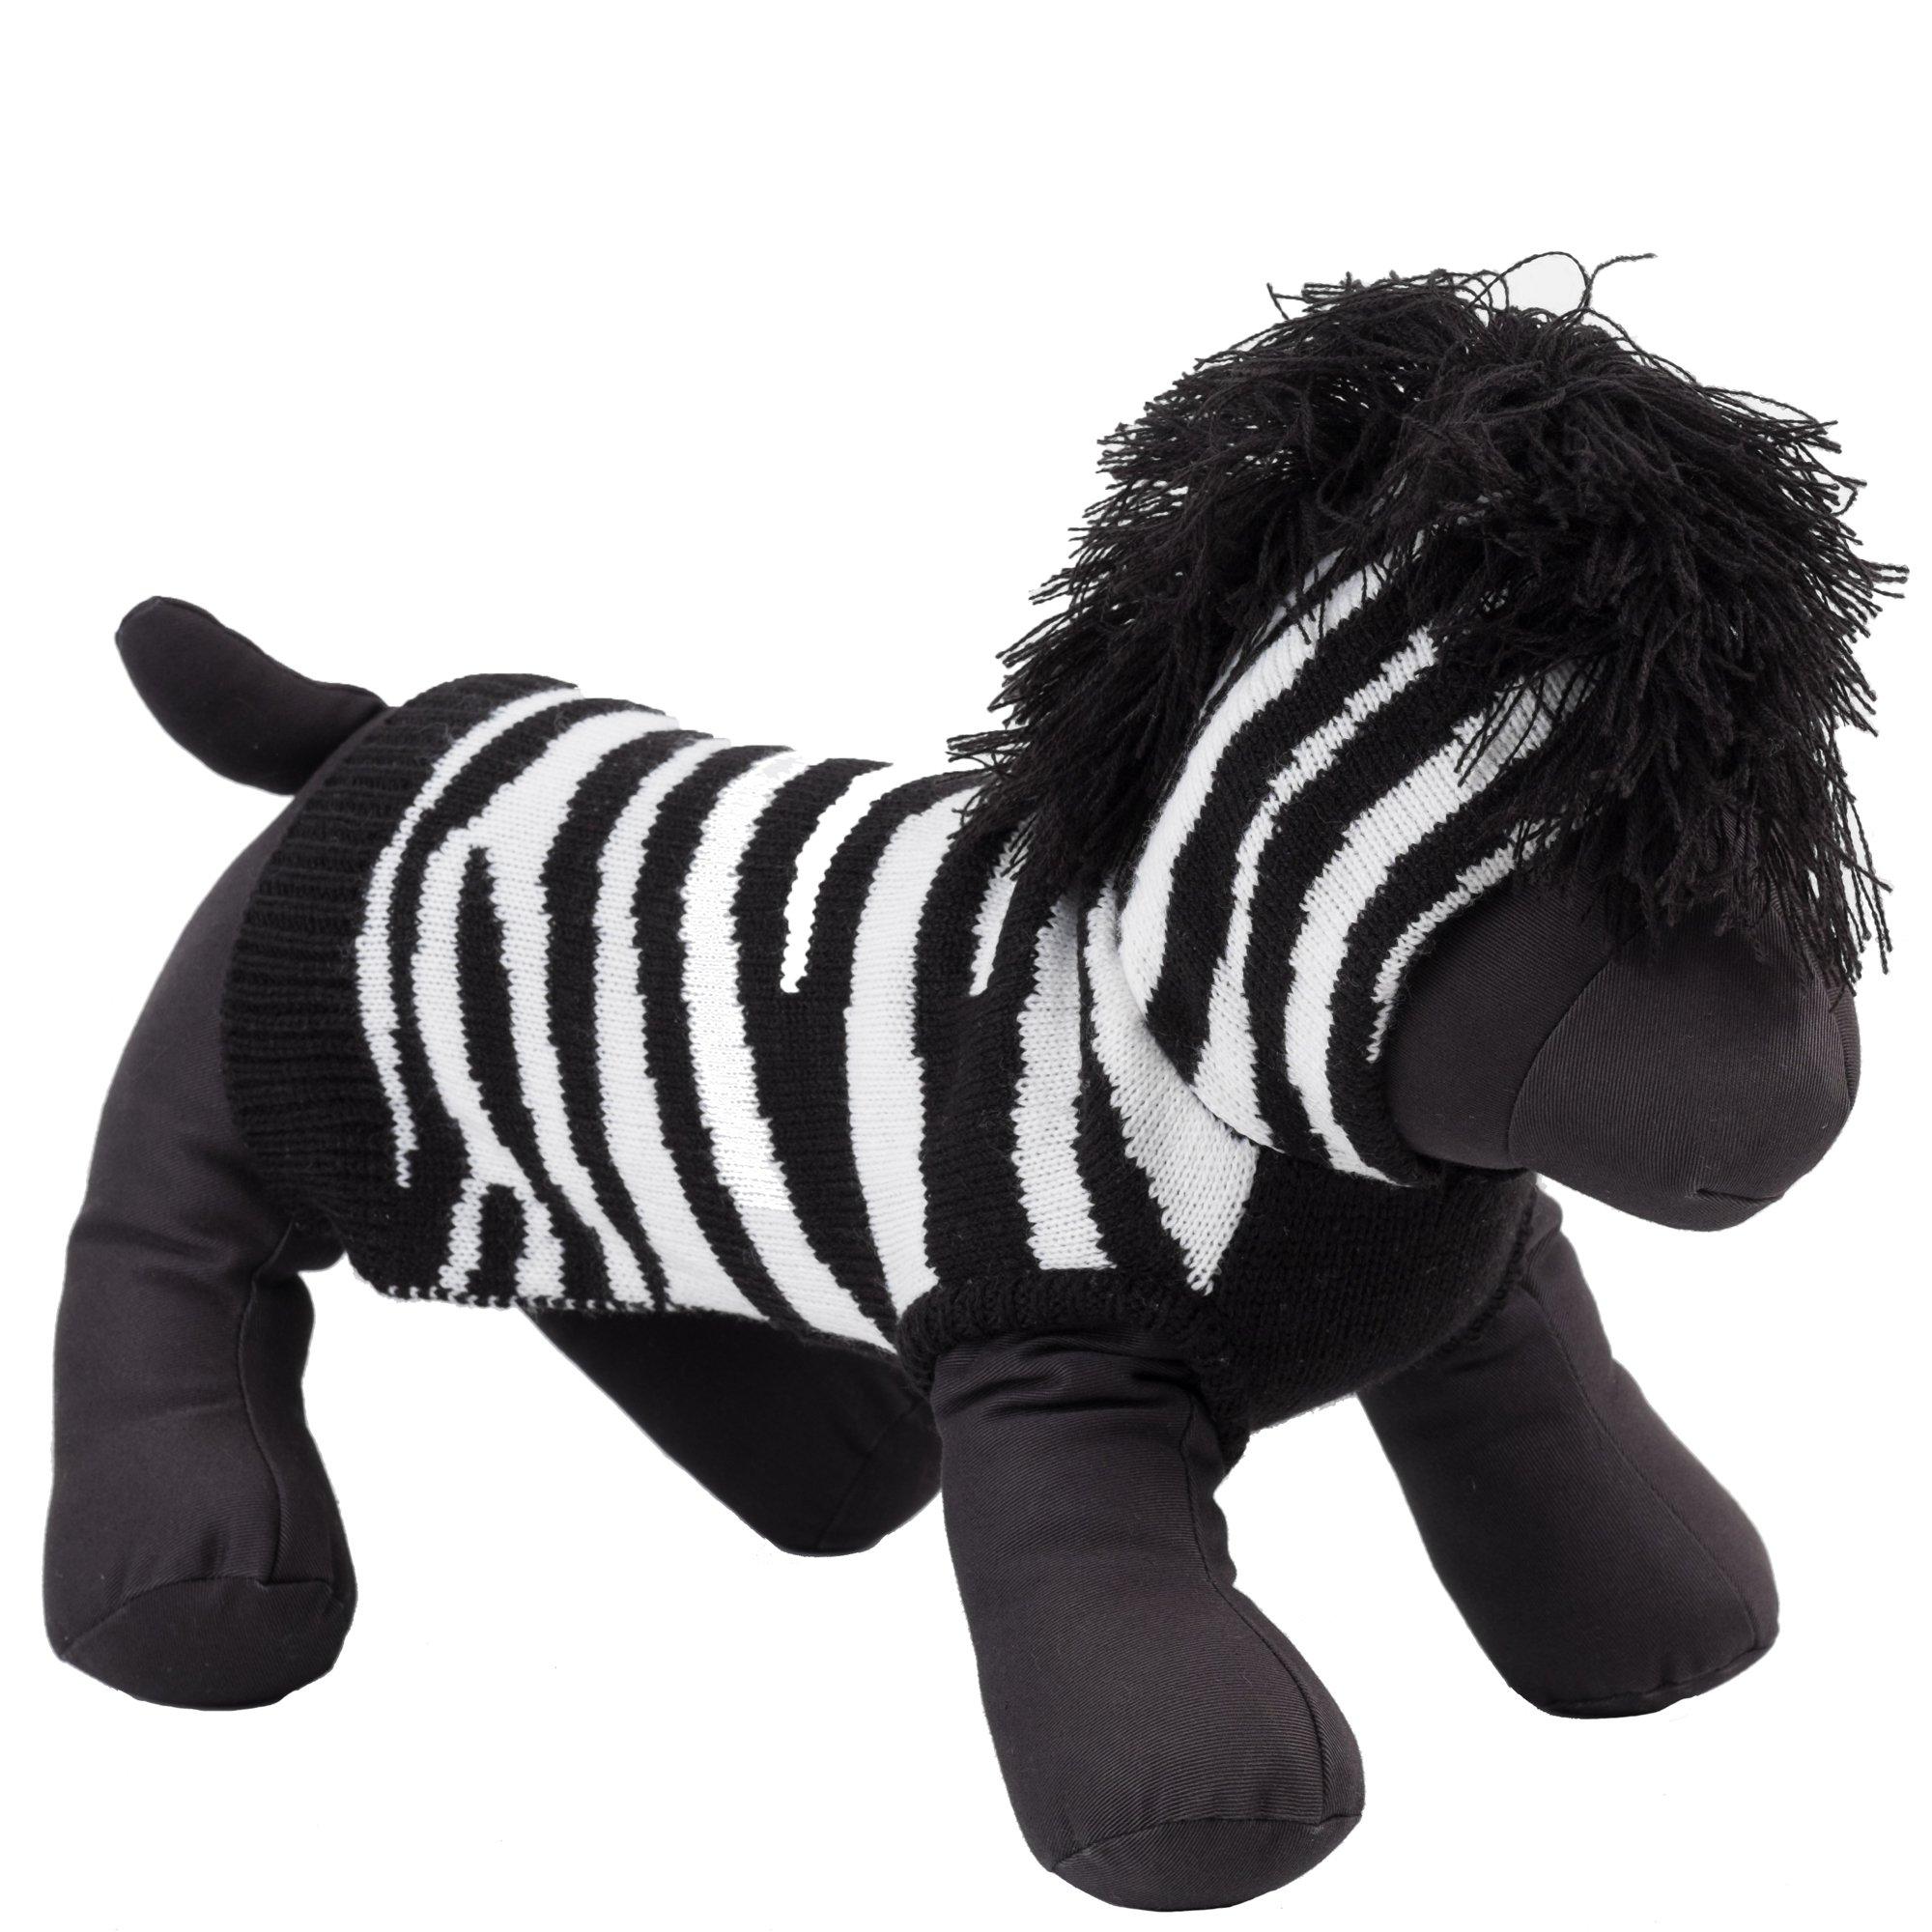 The Worthy Dog 6364 Zebra Hoodie, Black/White, M